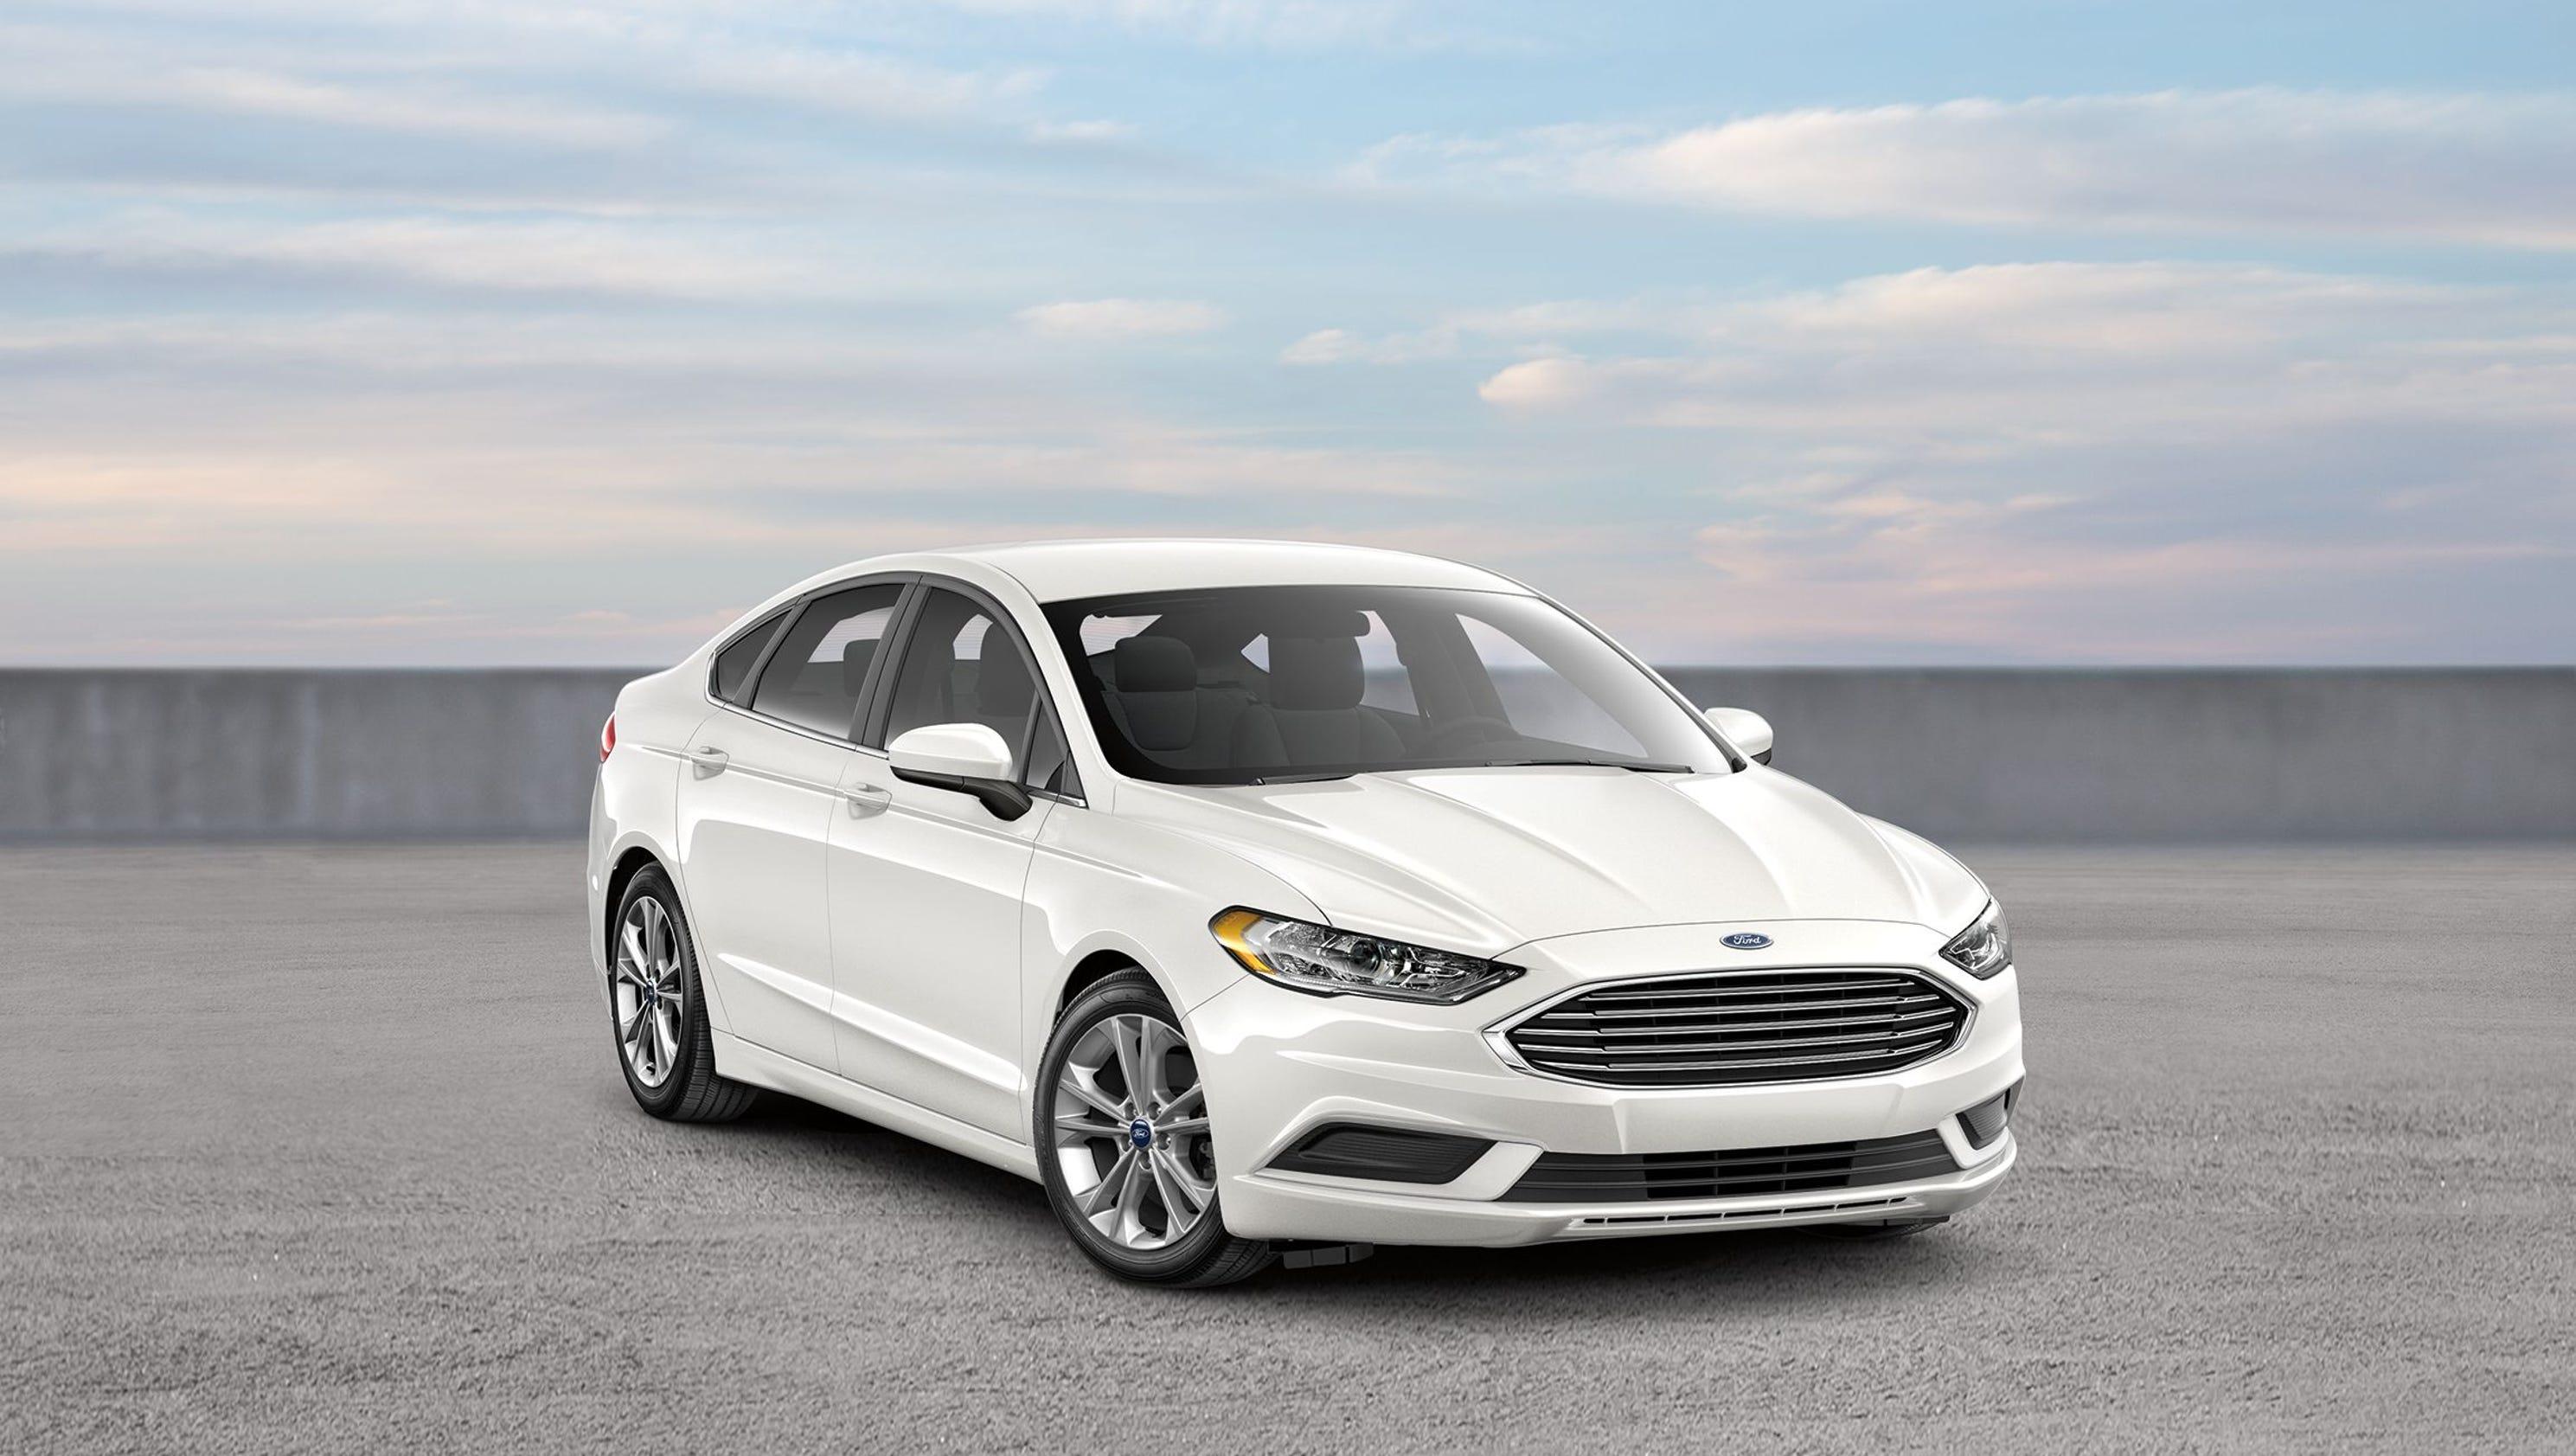 Popular Full-size Rental Cars